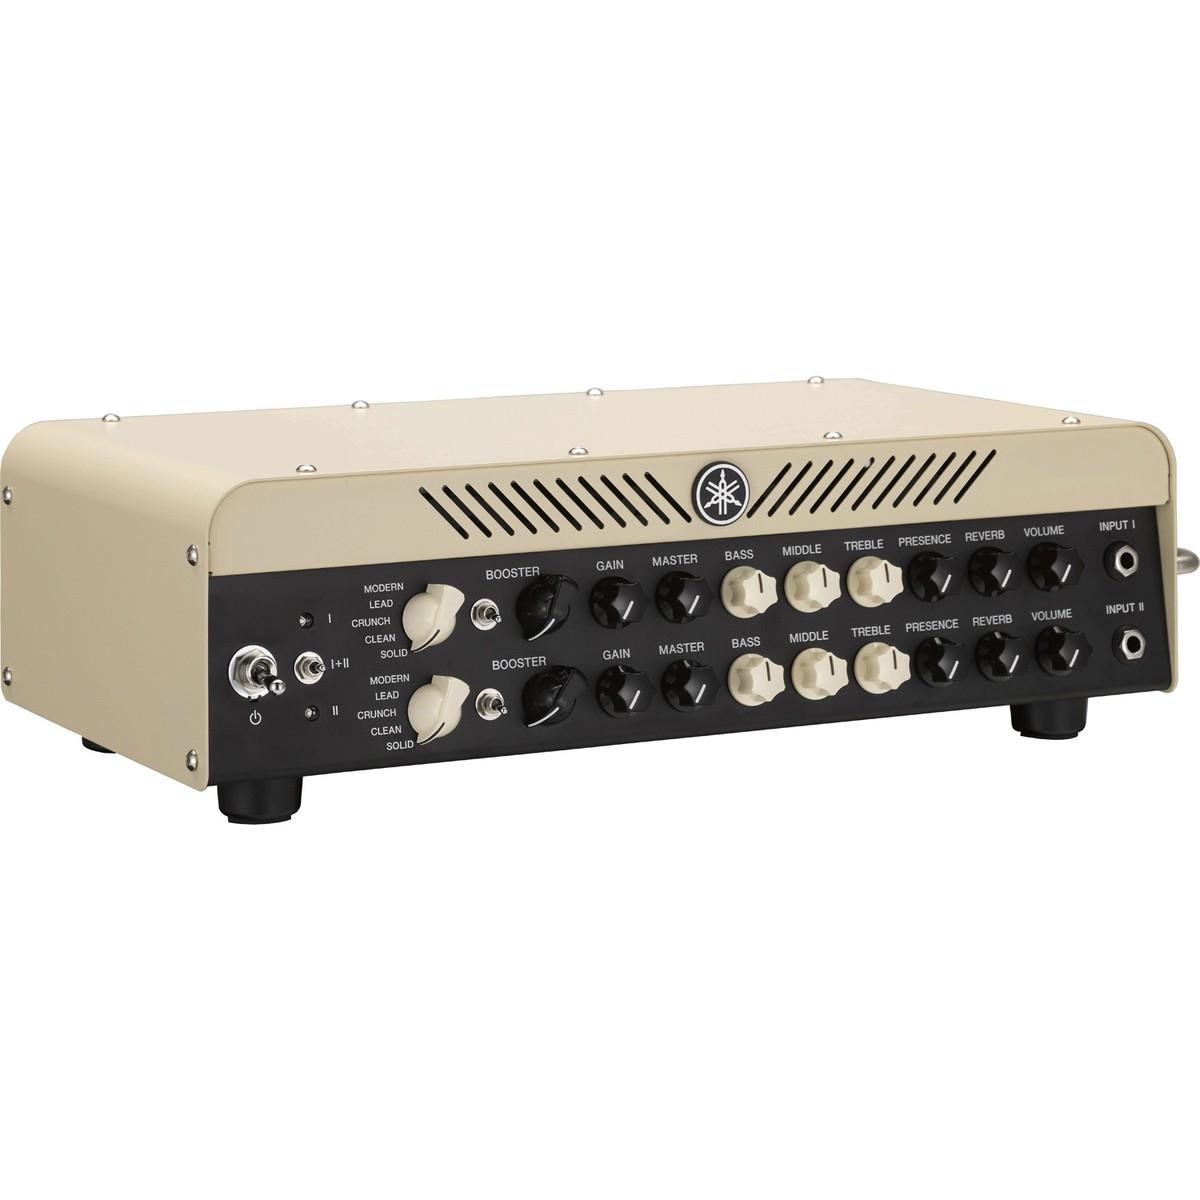 Yamaha thr100hd dual amp head b stock at for Yamaha bass guitar amplifier